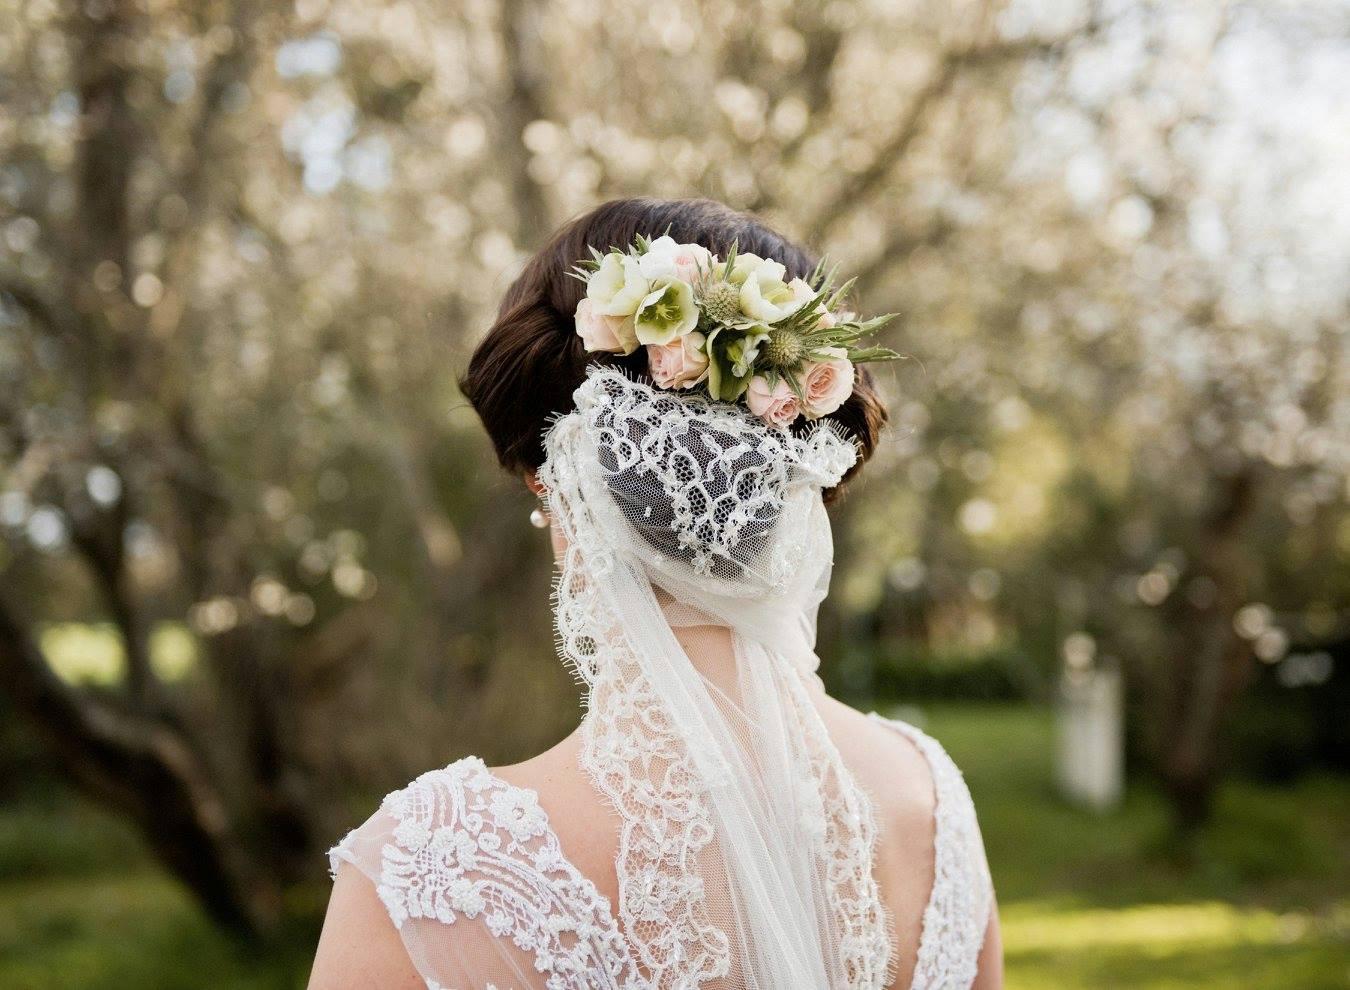 Soft pastel floral headpiece